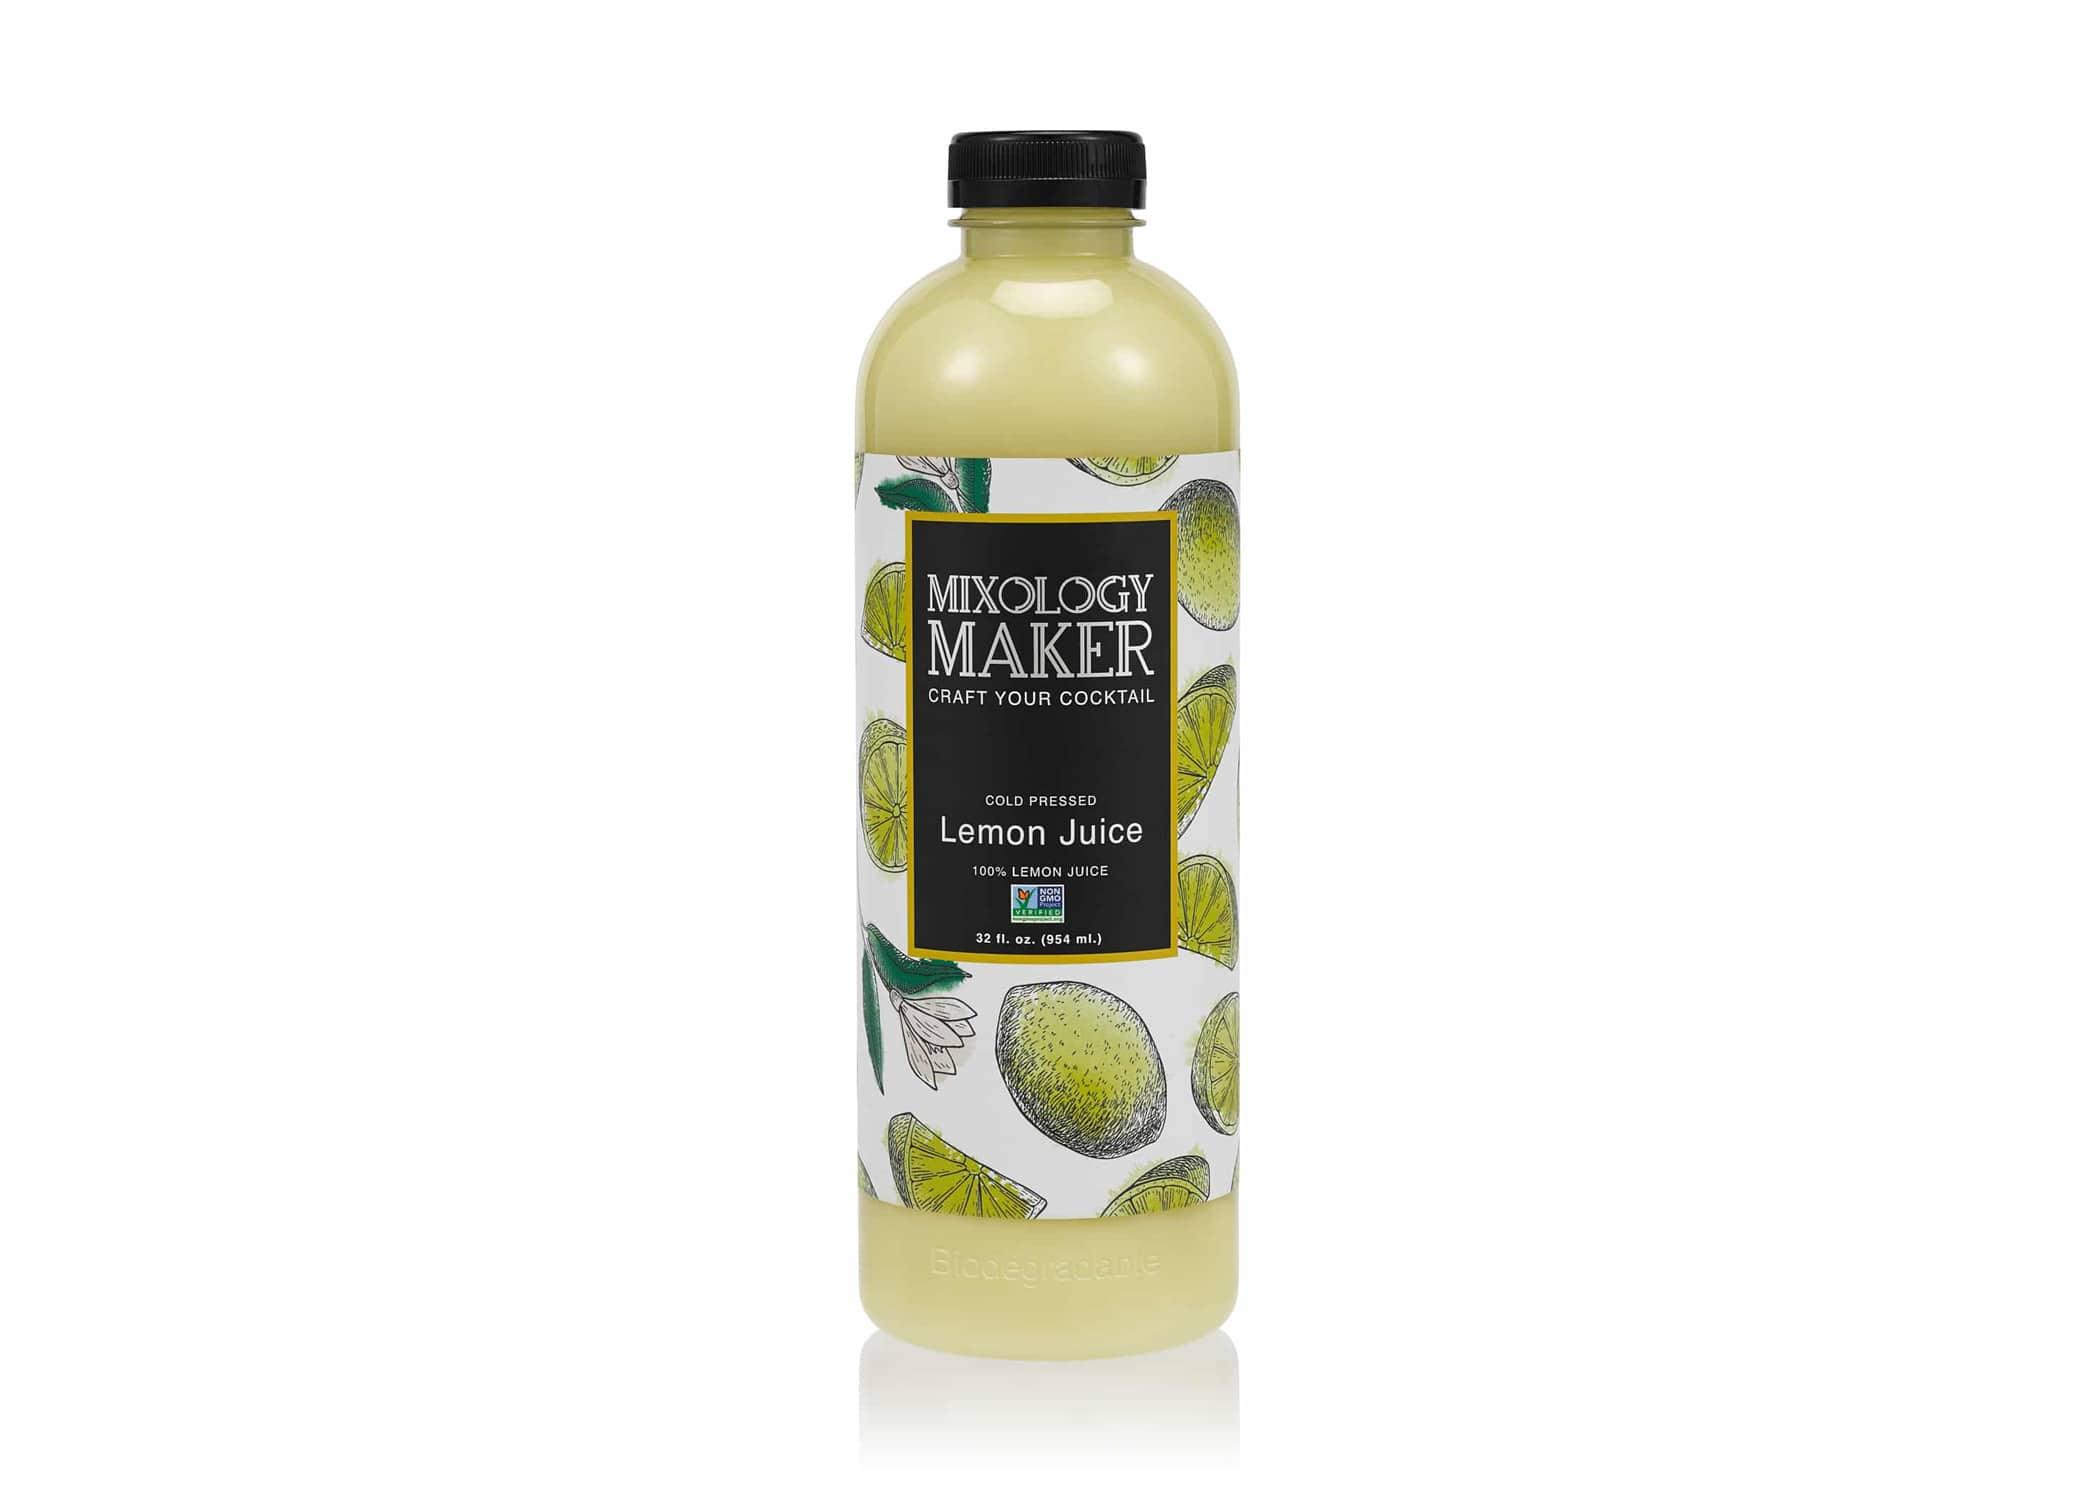 Mixology Maker drink packaging design showcasing Lemon Juice flavor with bright label design against white backdrop.